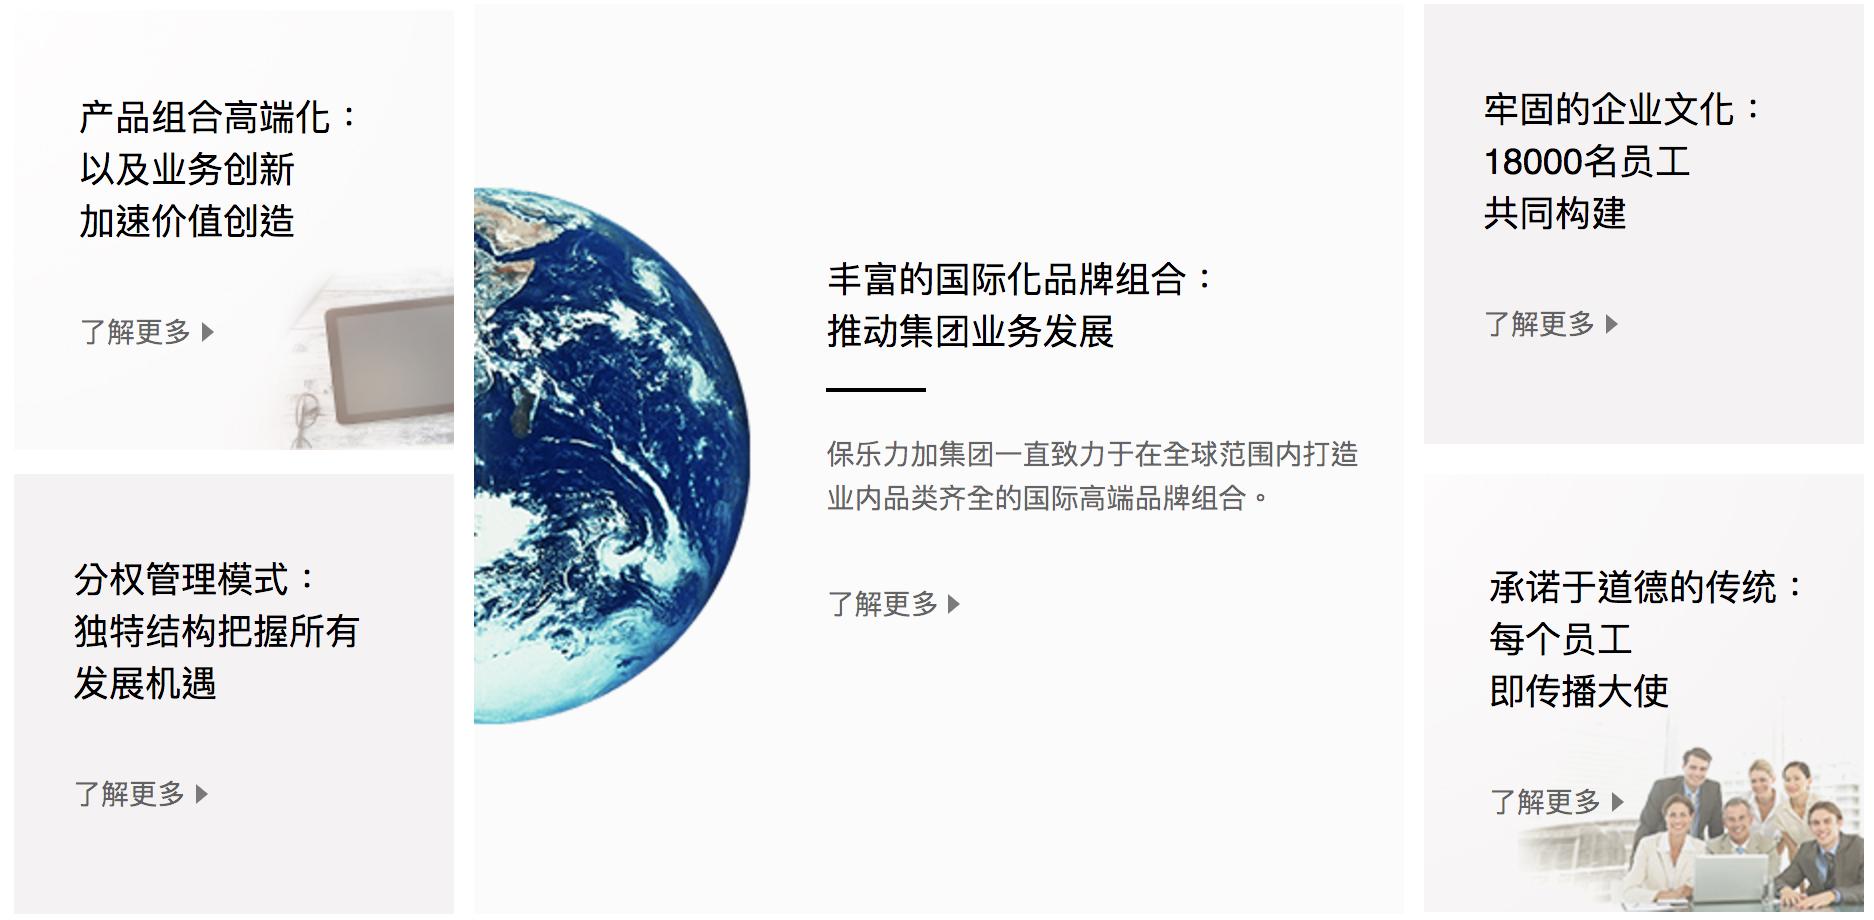 http://www.pernod-ricard-china.com.cn/cn/aboutus/